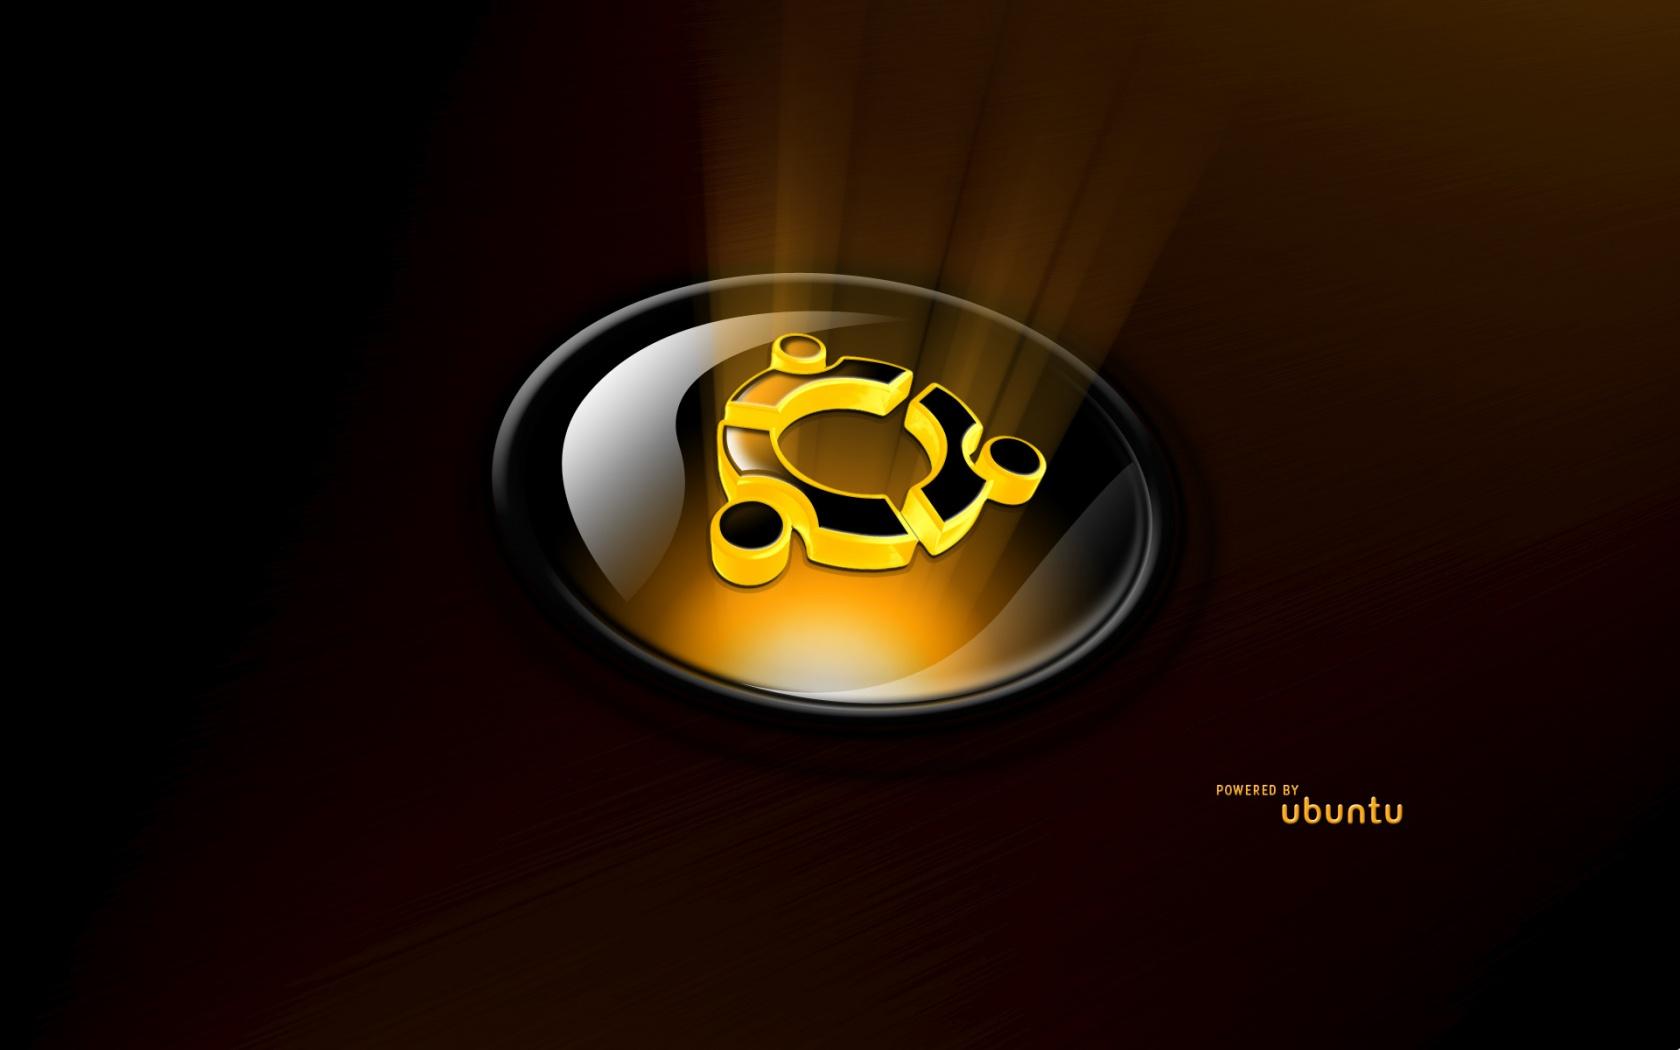 Powered By Ubuntu 1680 x 1050 Download Close 1680x1050